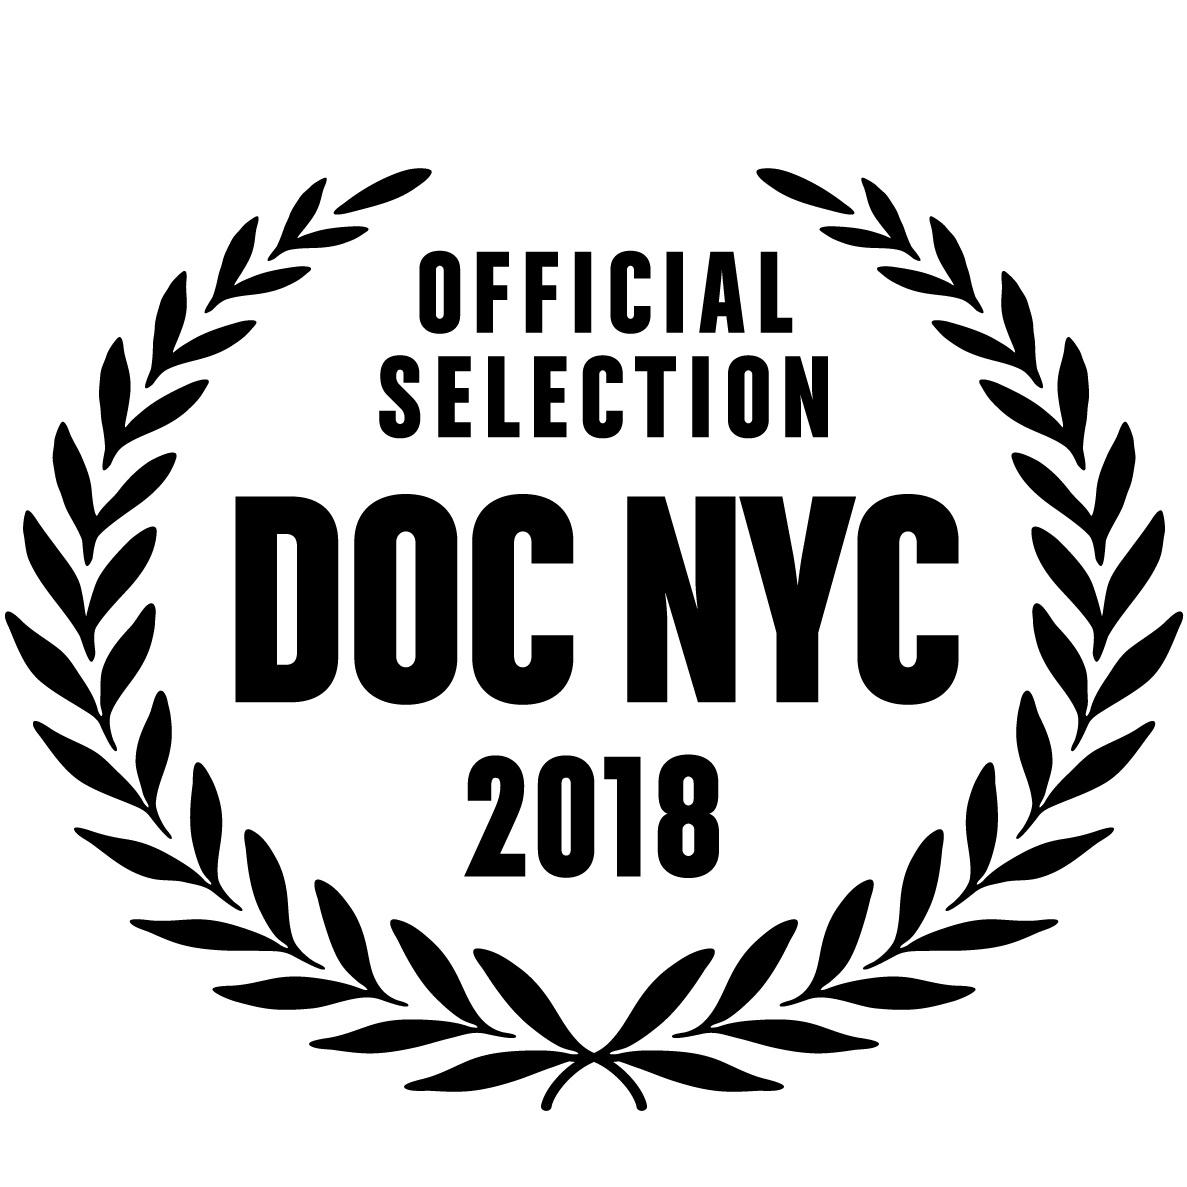 DOCNYC18Laurels_Black-officialselection.jpg